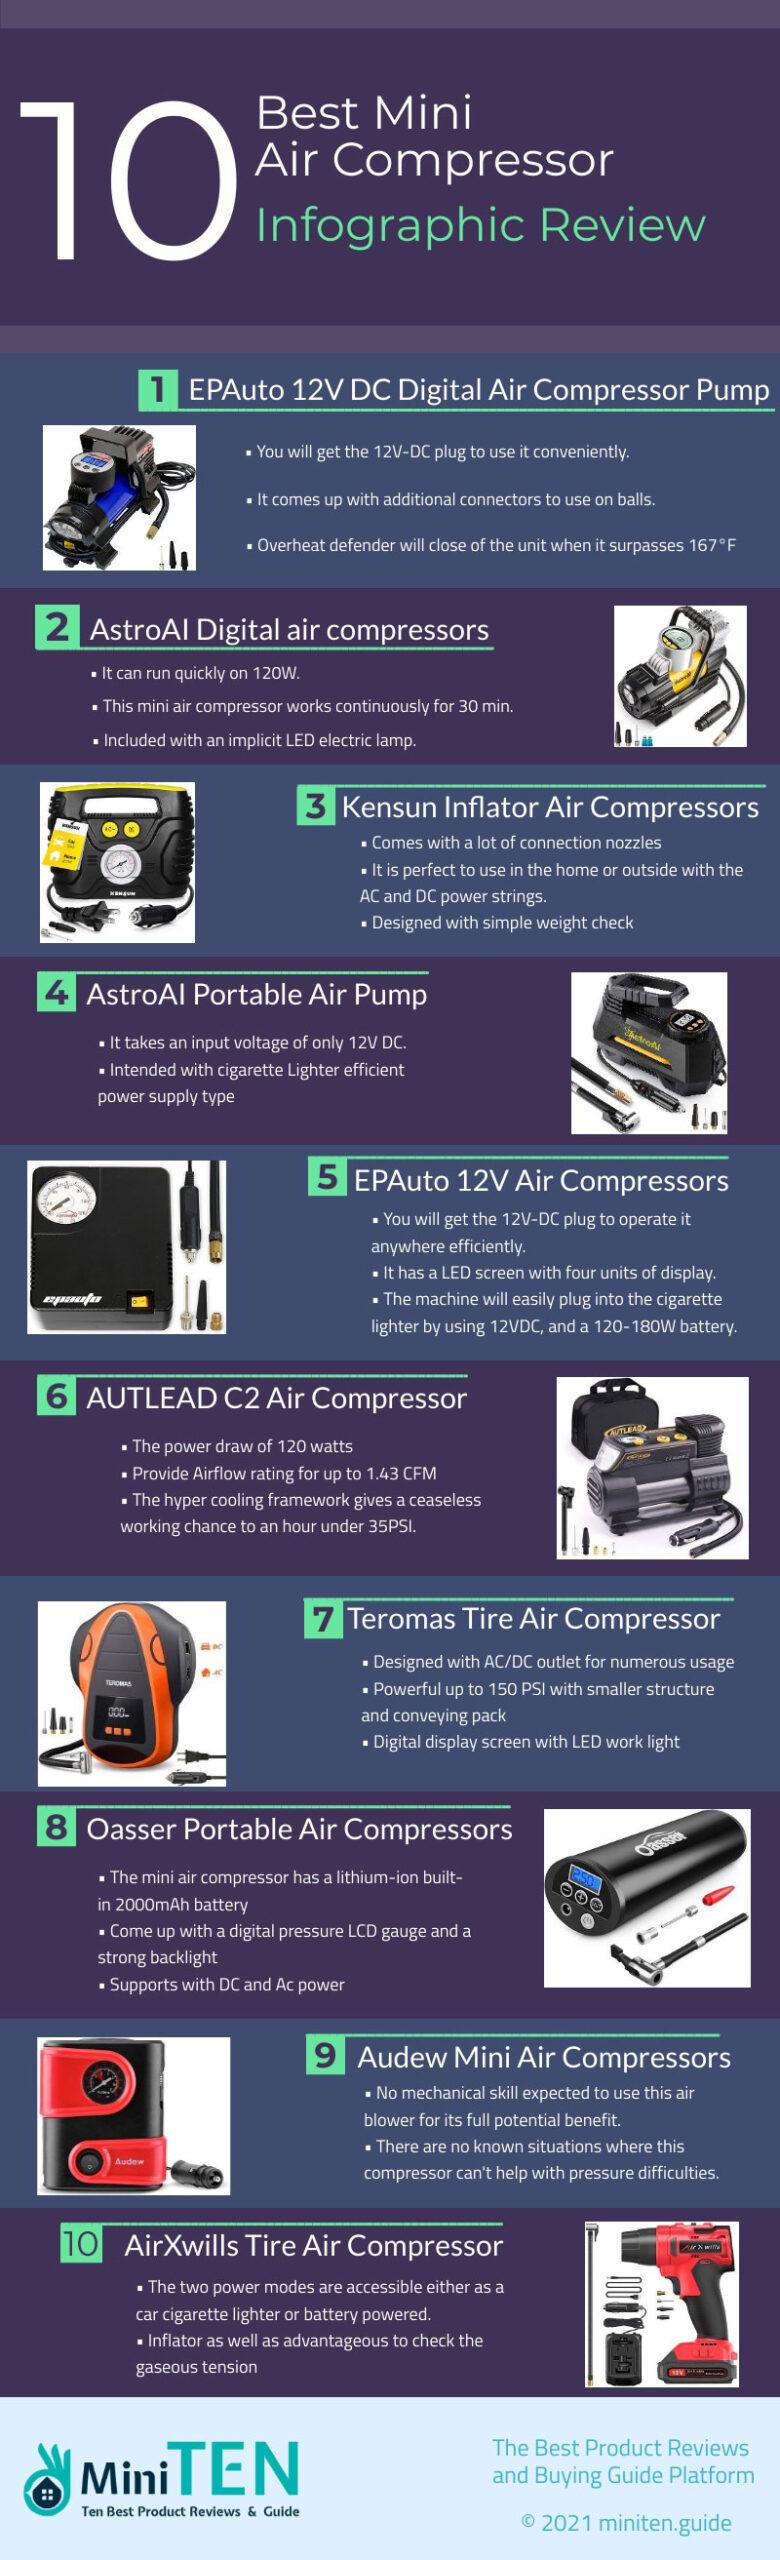 mini air compressor infographic